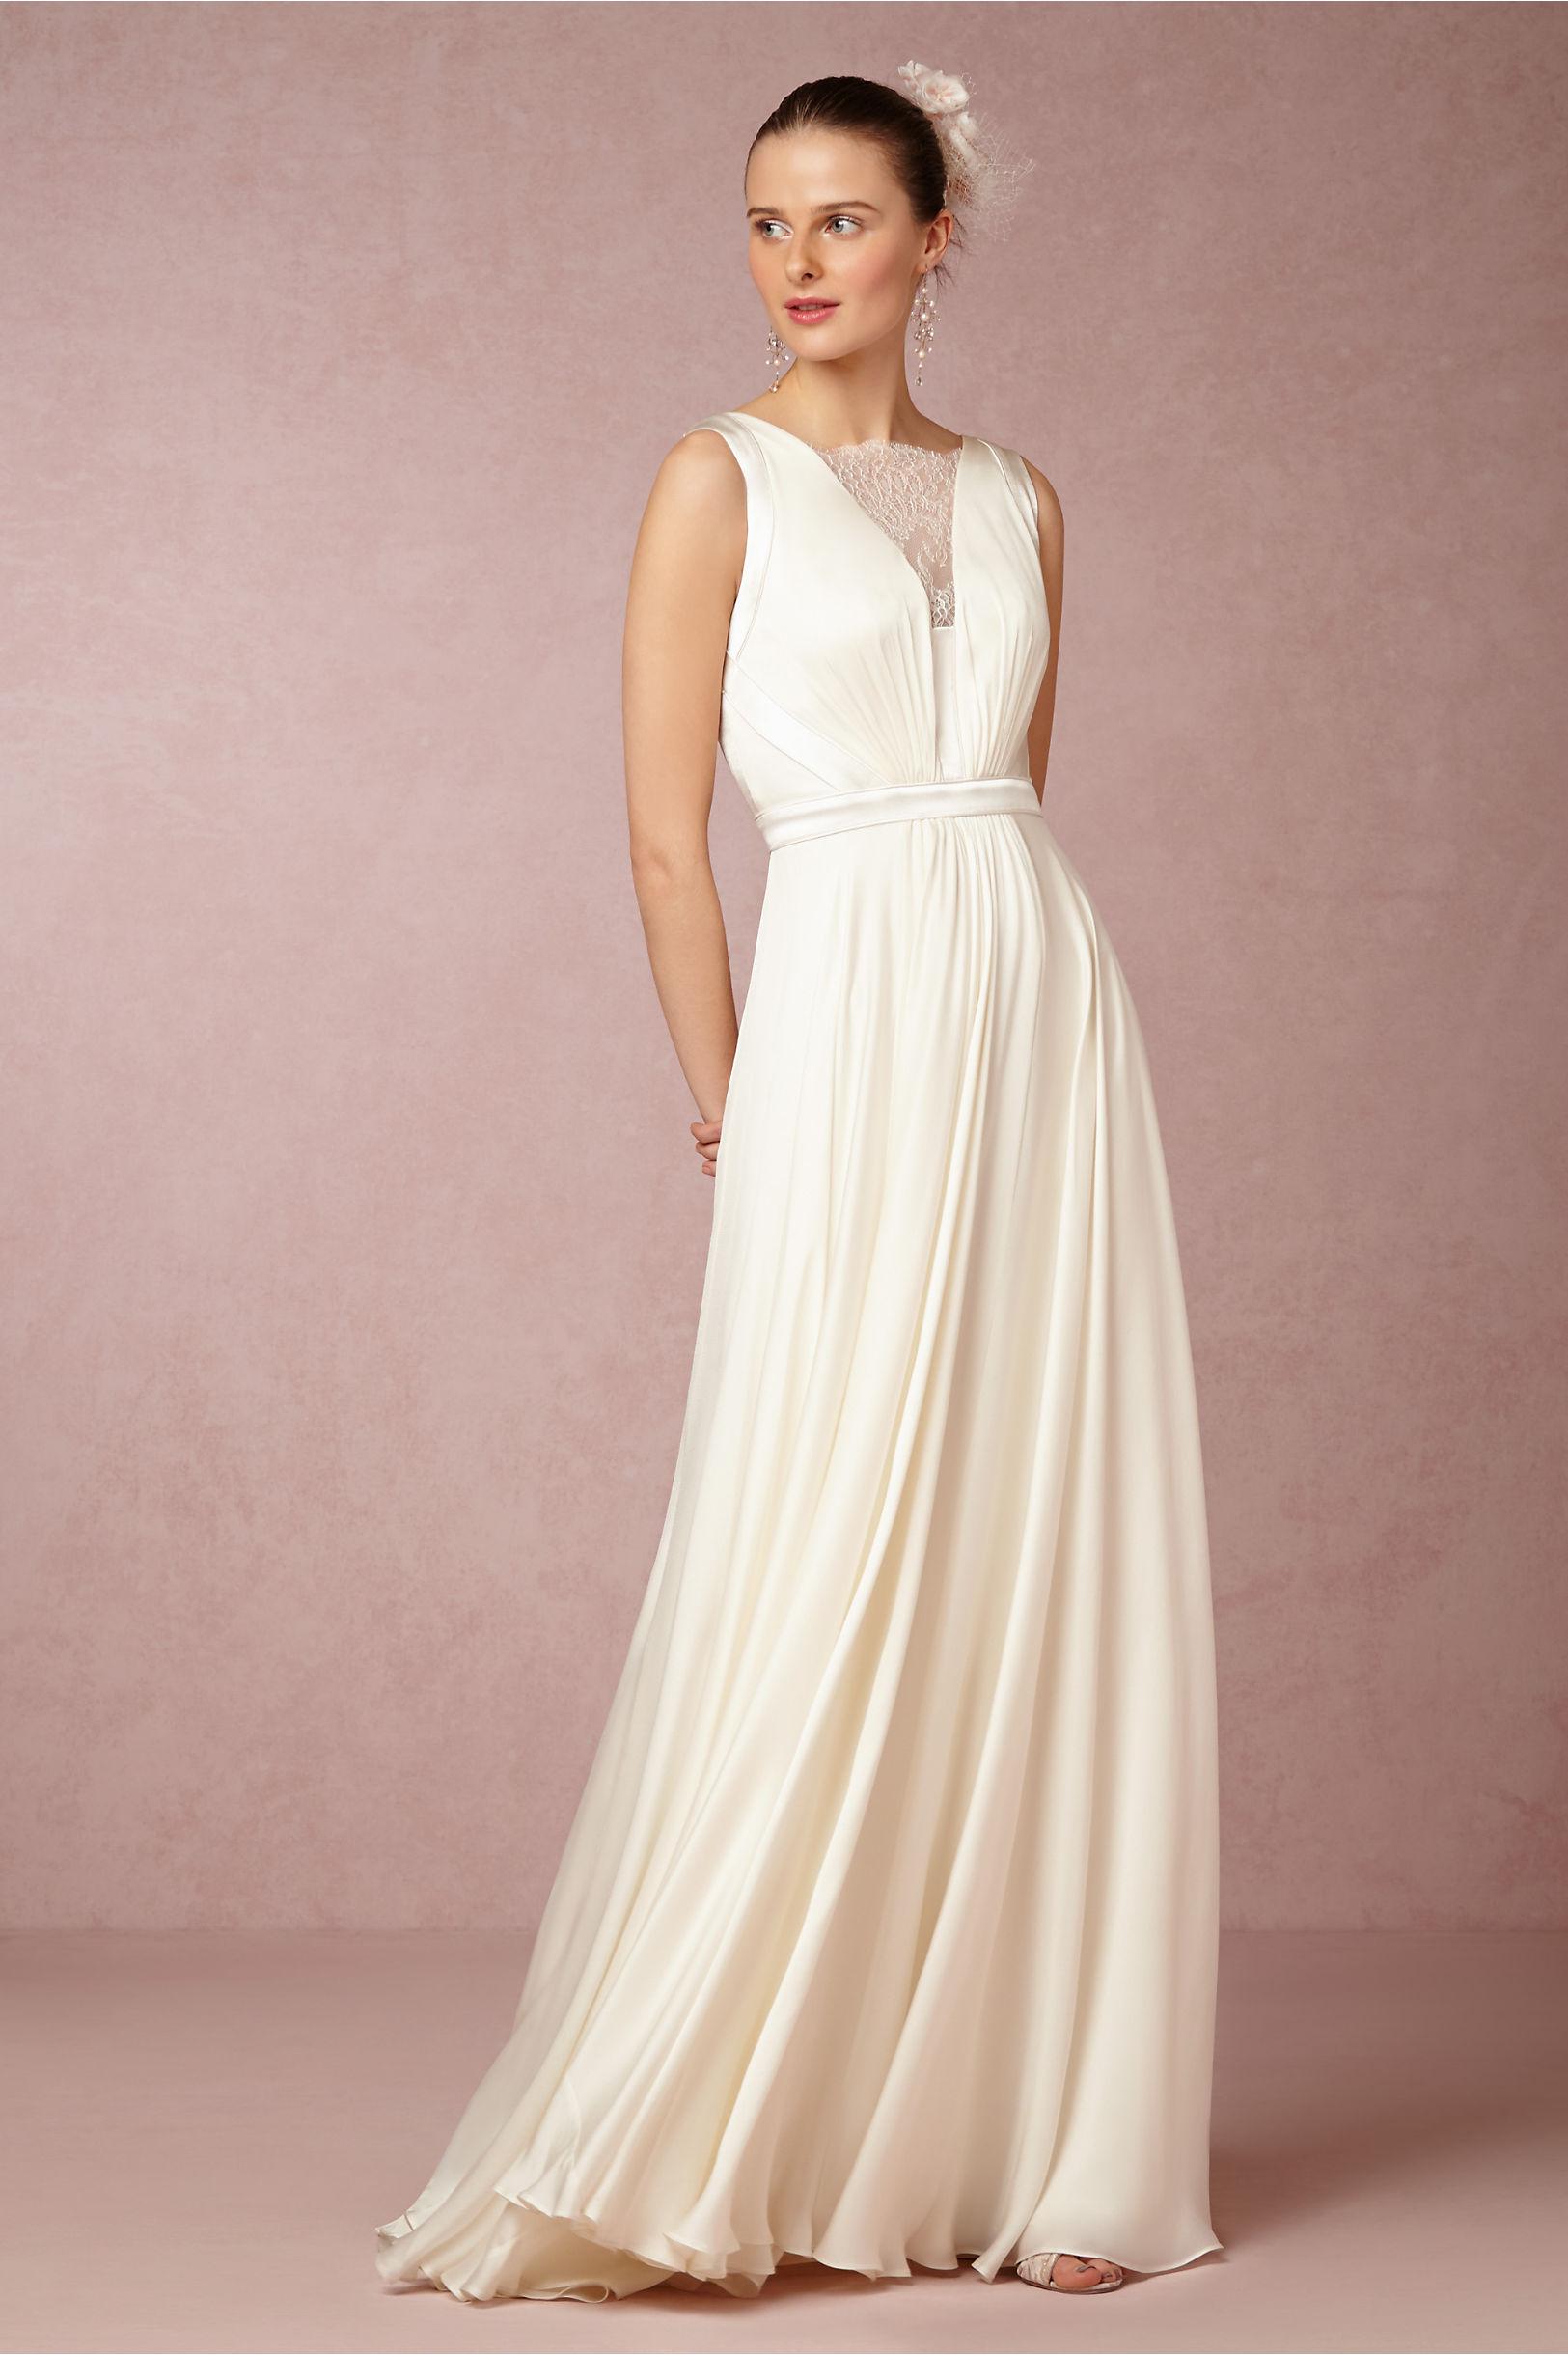 Angel Gown in Bride | BHLDN